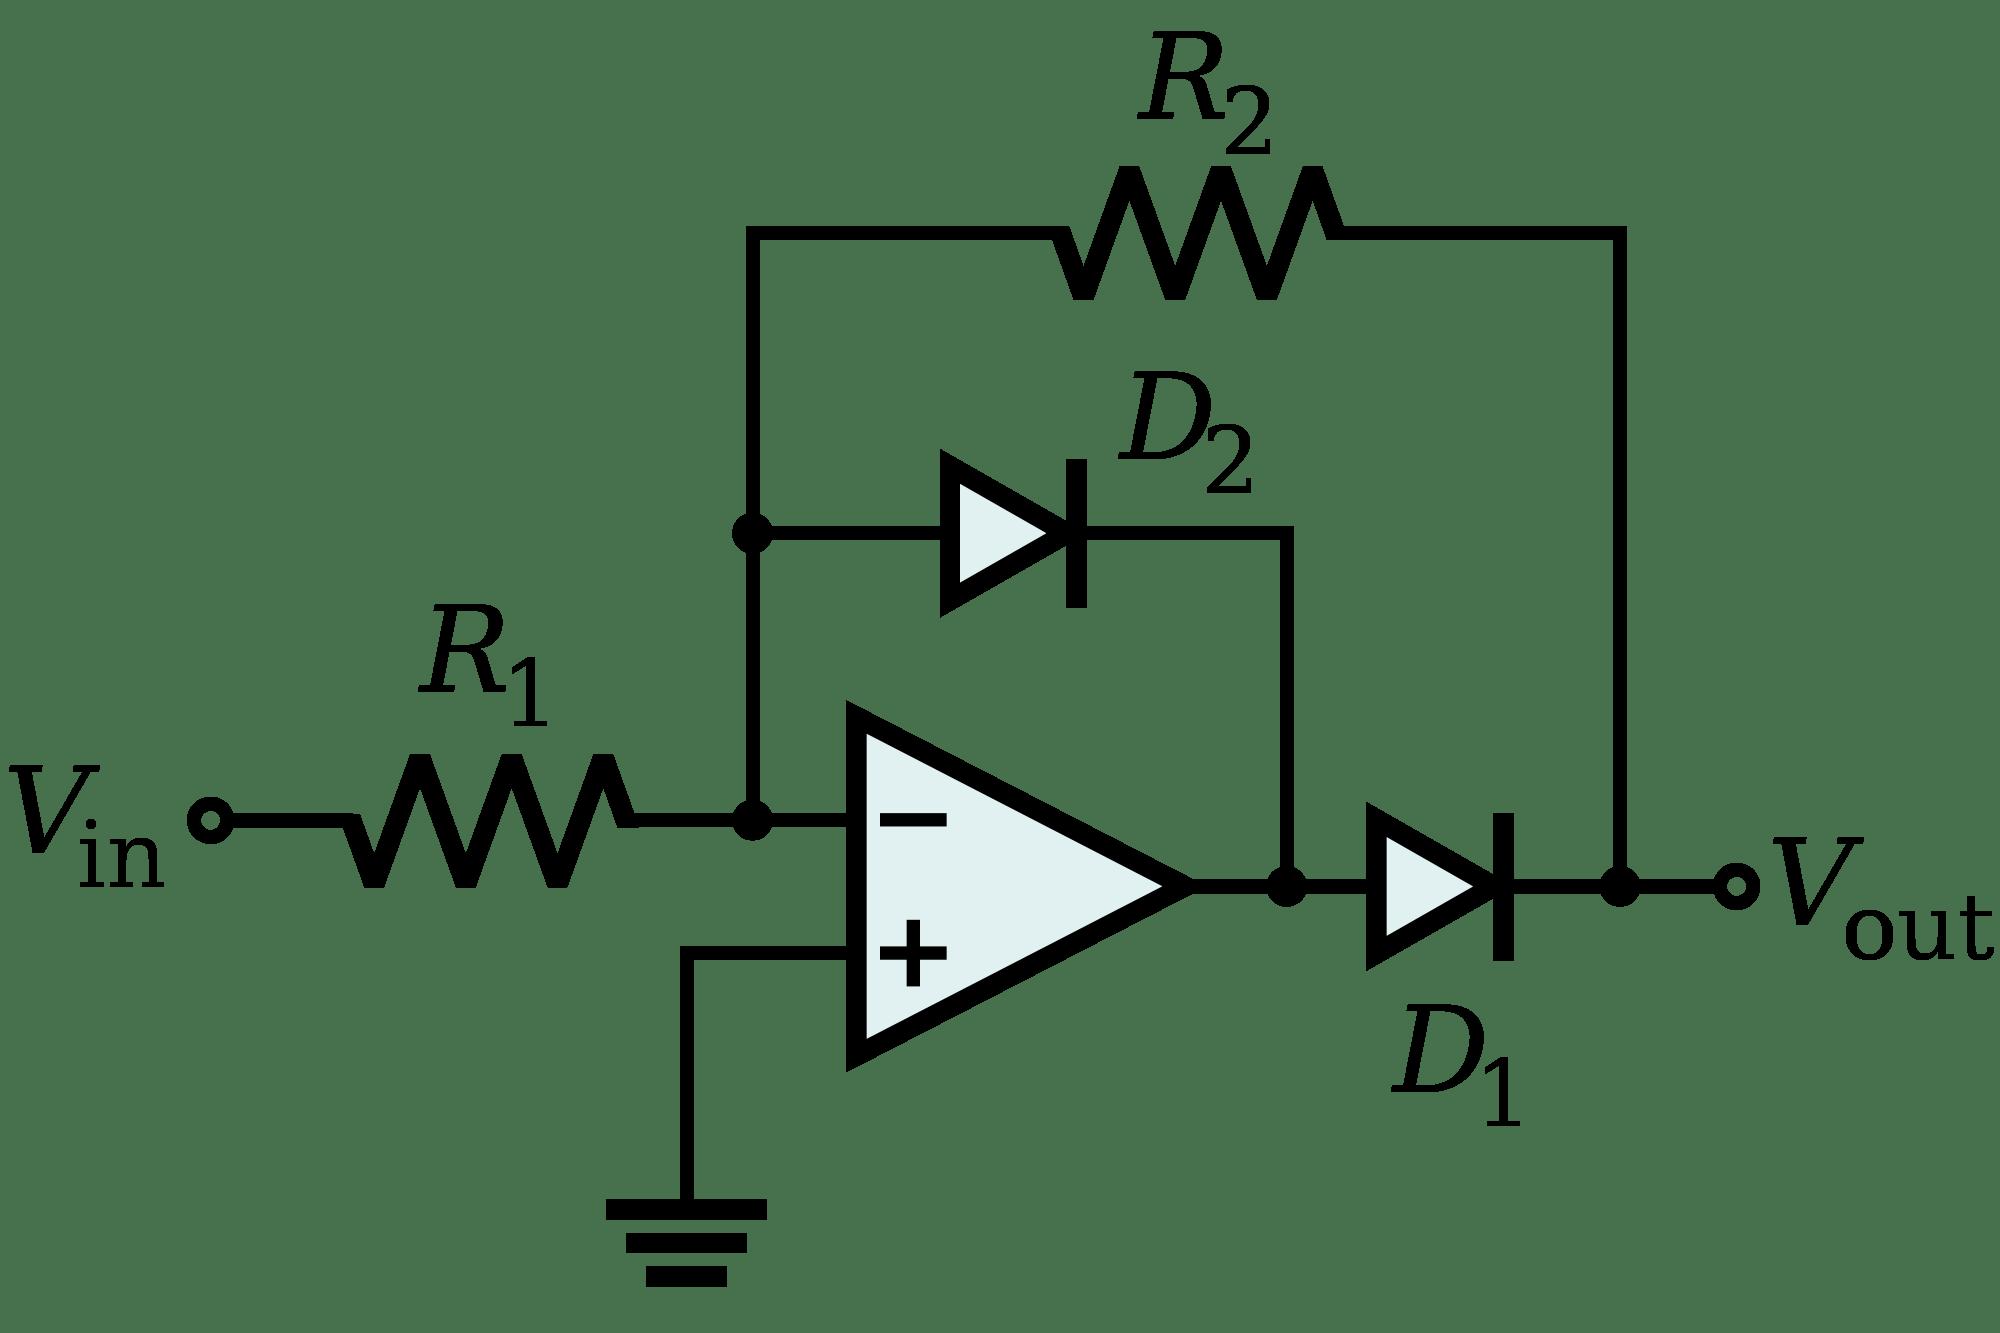 simple precision rectifier circuit stumped